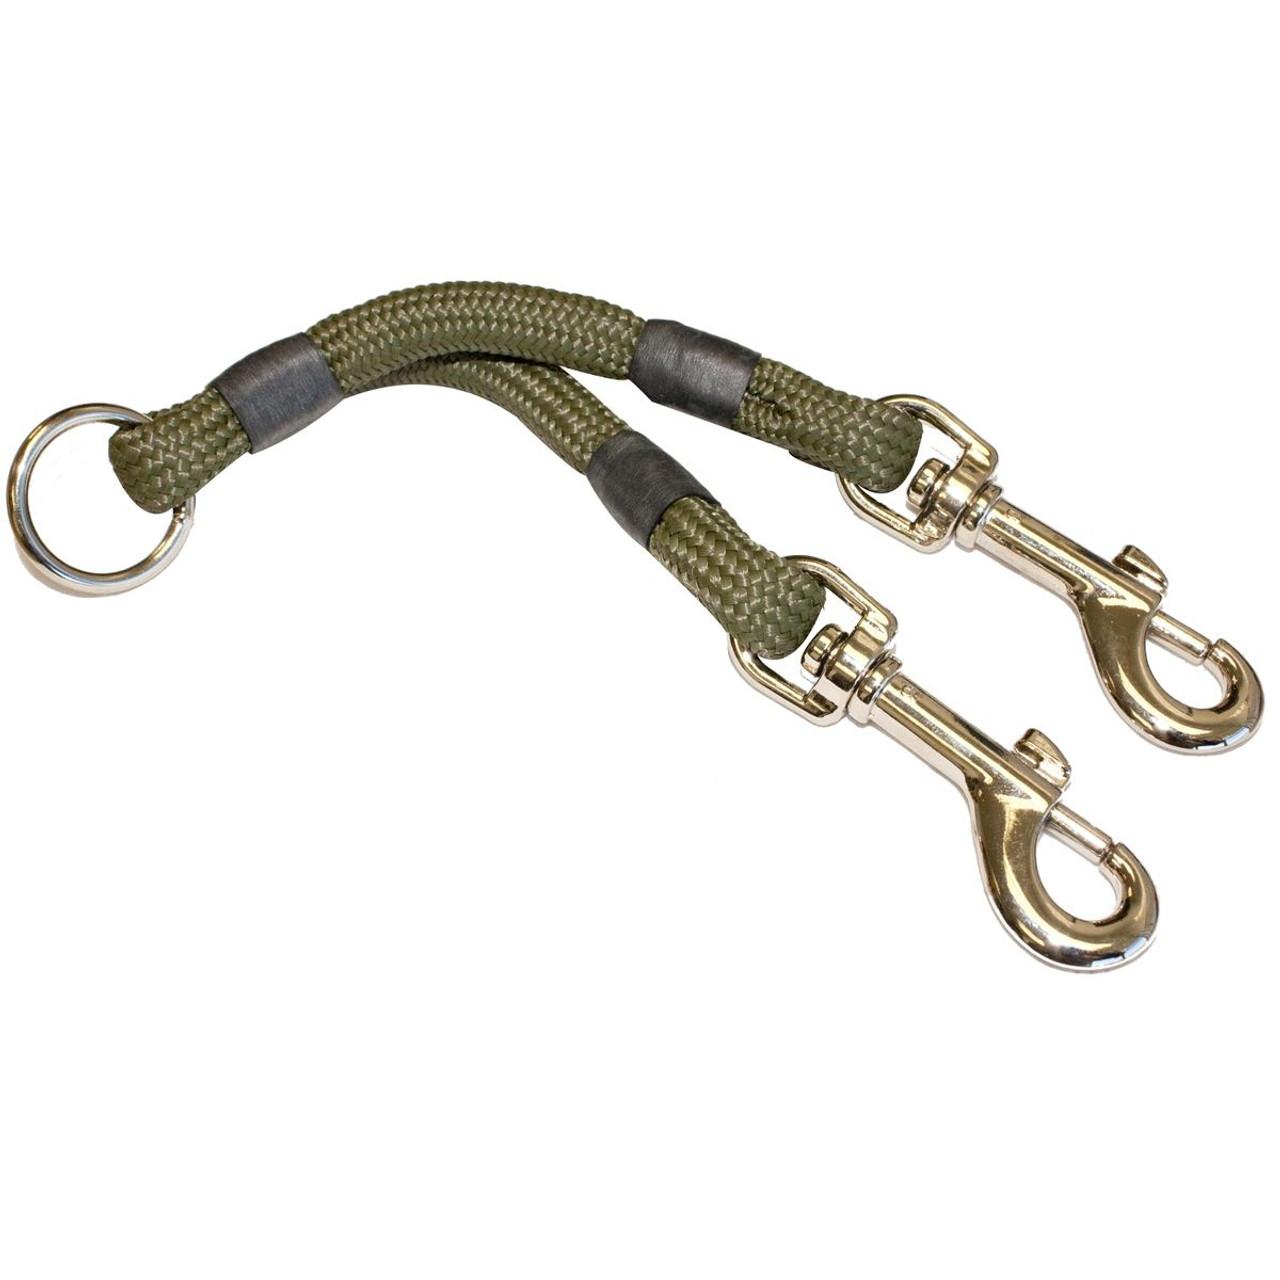 Bisley Dog Clip Brace